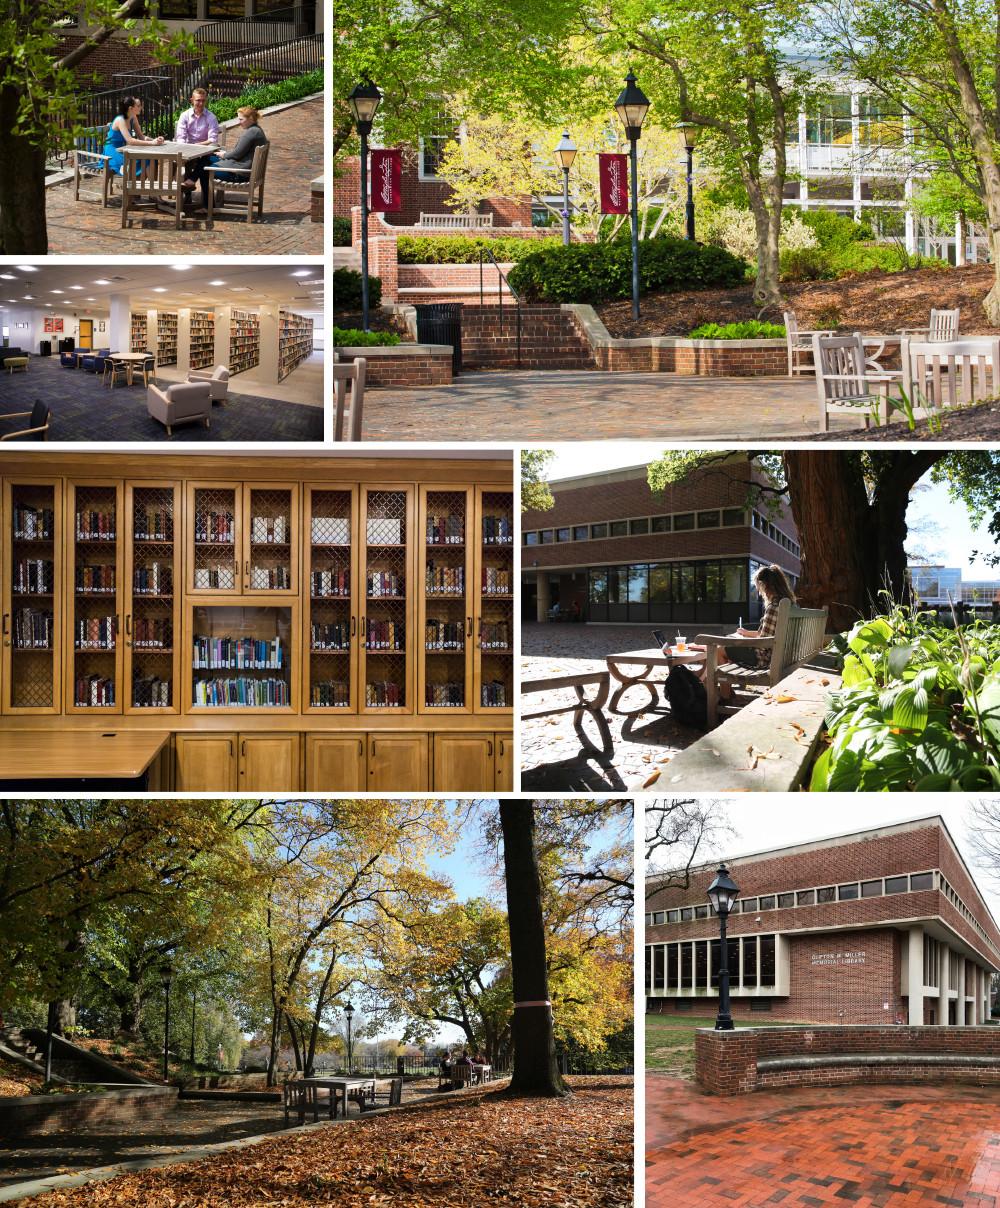 Kent County: Washington College